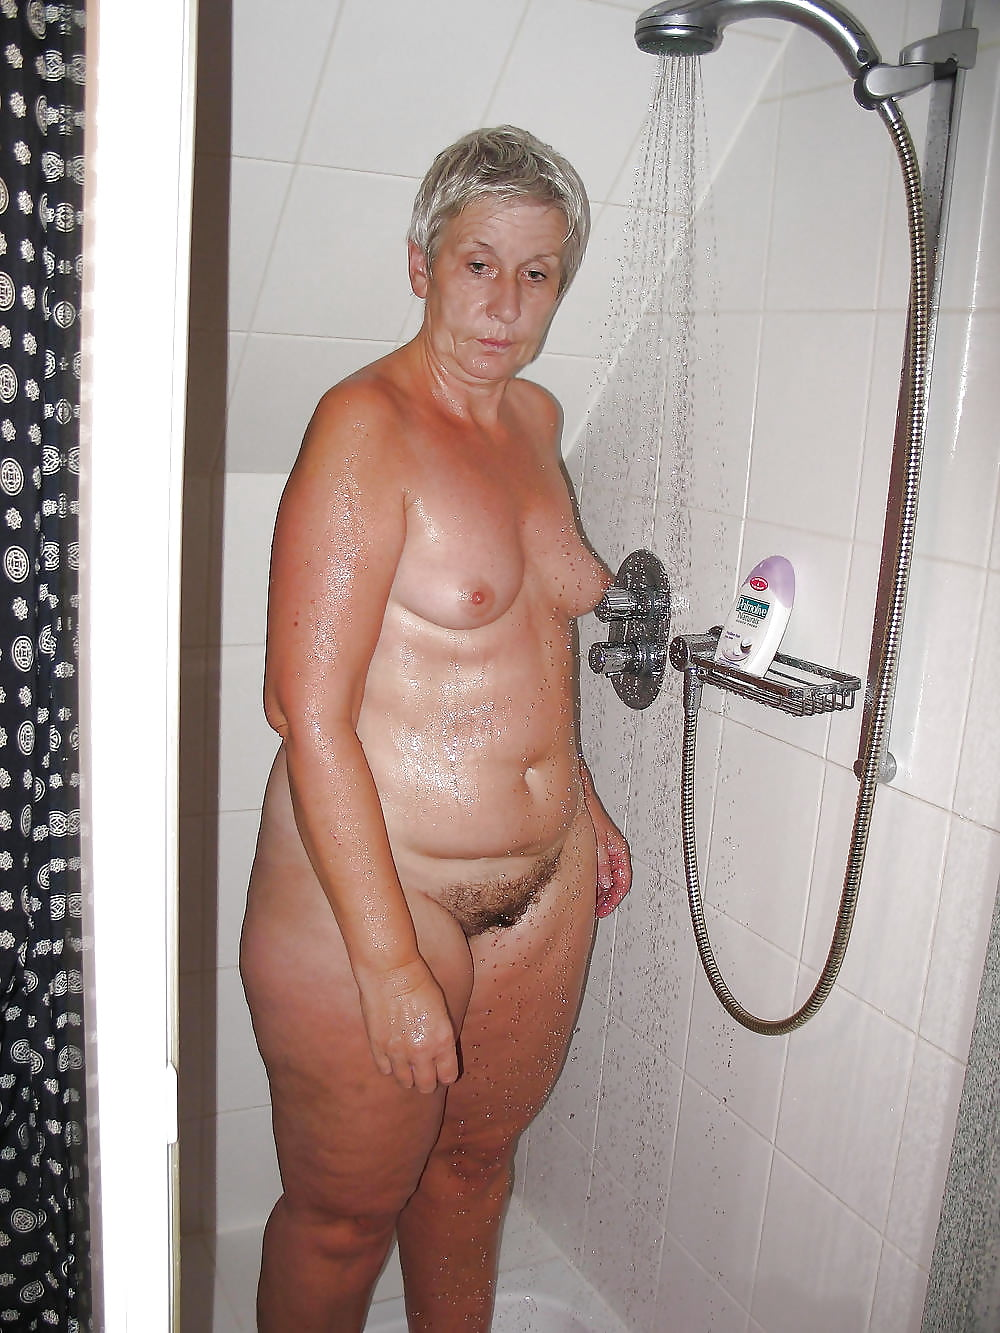 Sucking young grandma sexy shower pic sharma get